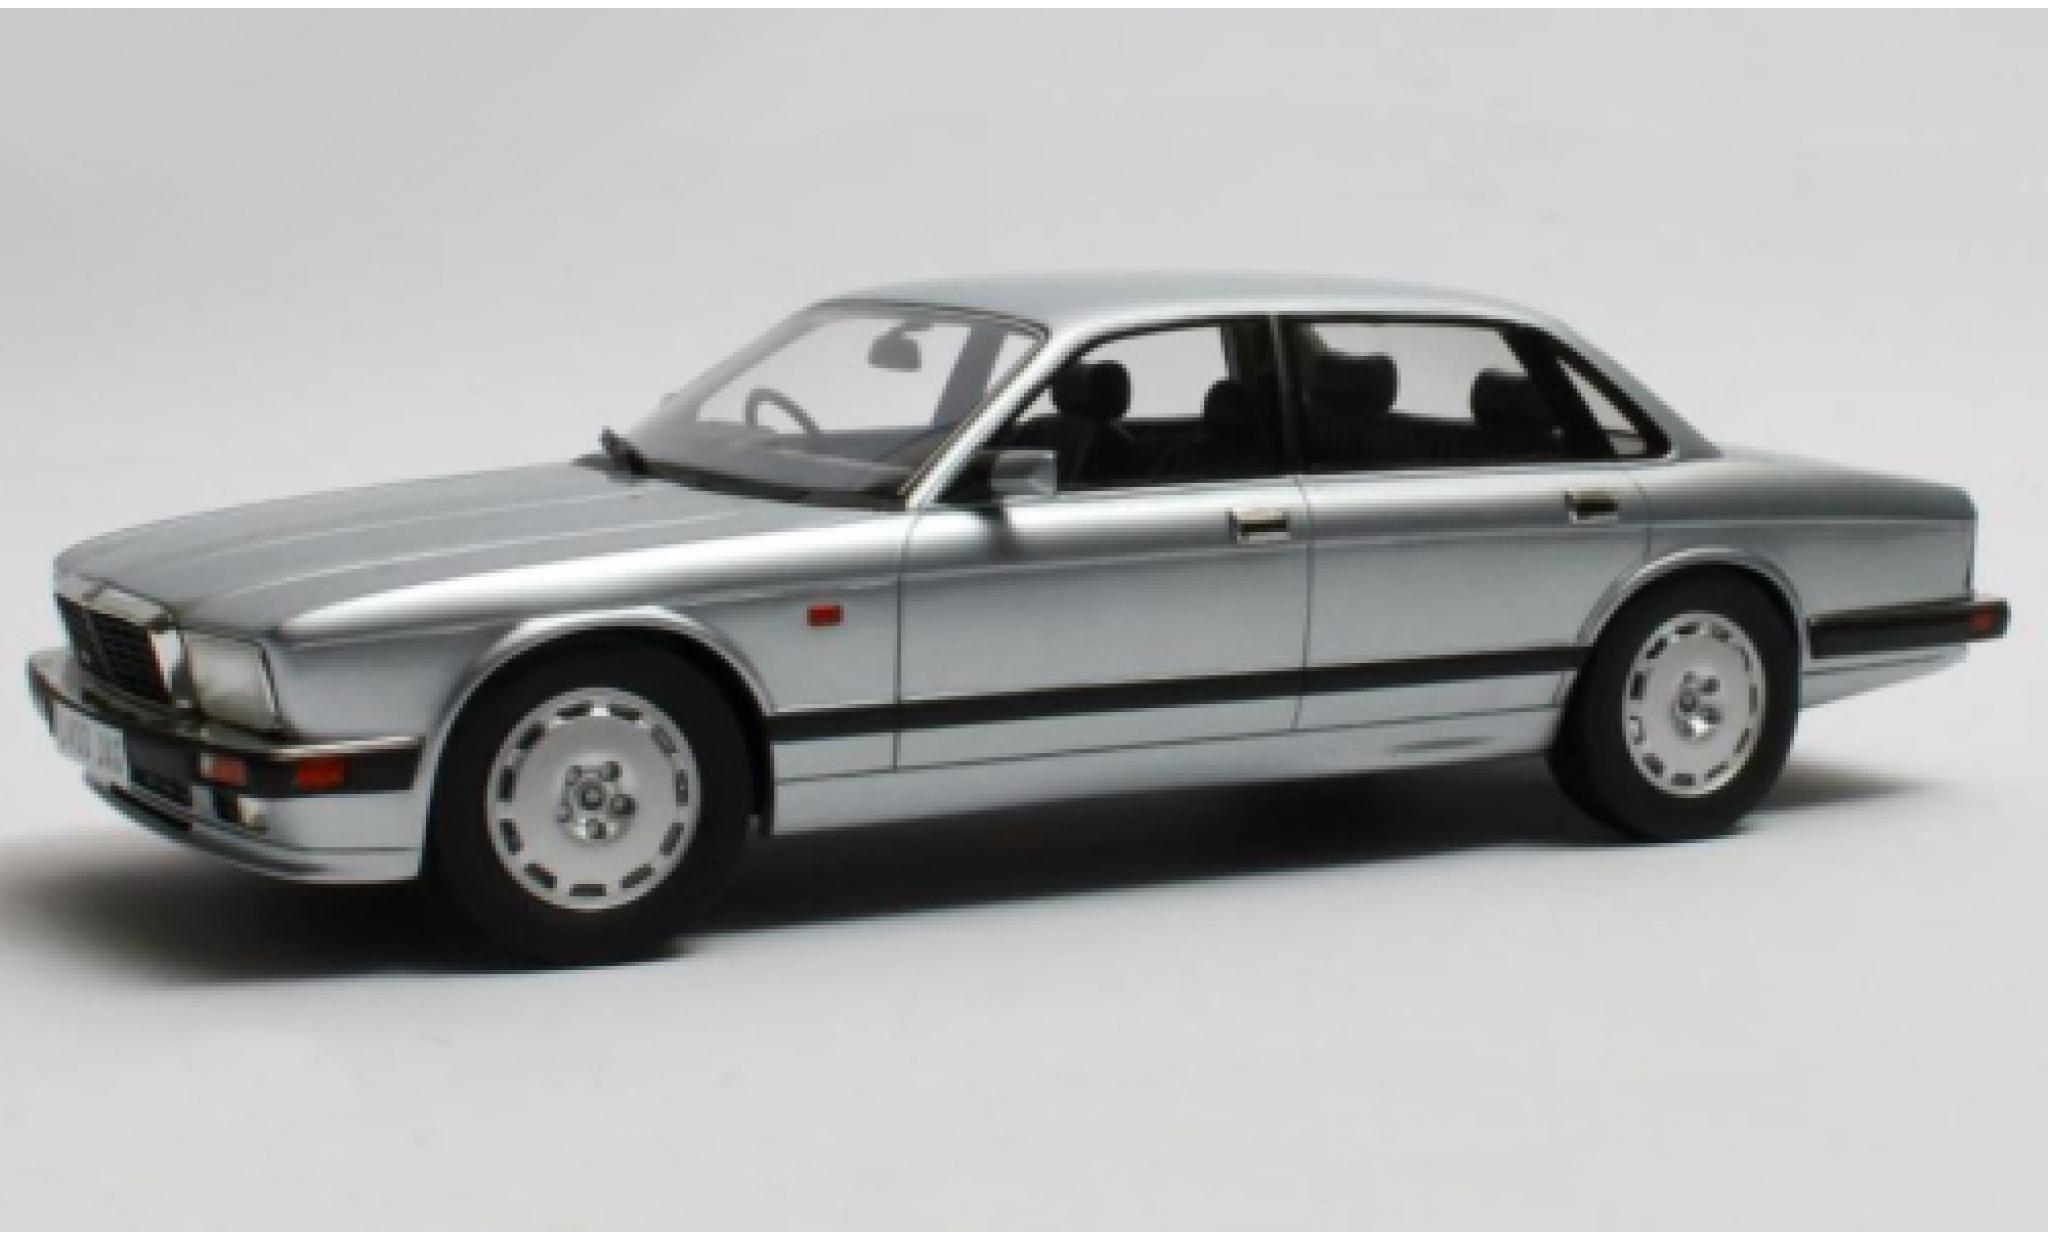 Jaguar XJ 1/18 Cult Scale Models R (40) grise RHD 1990